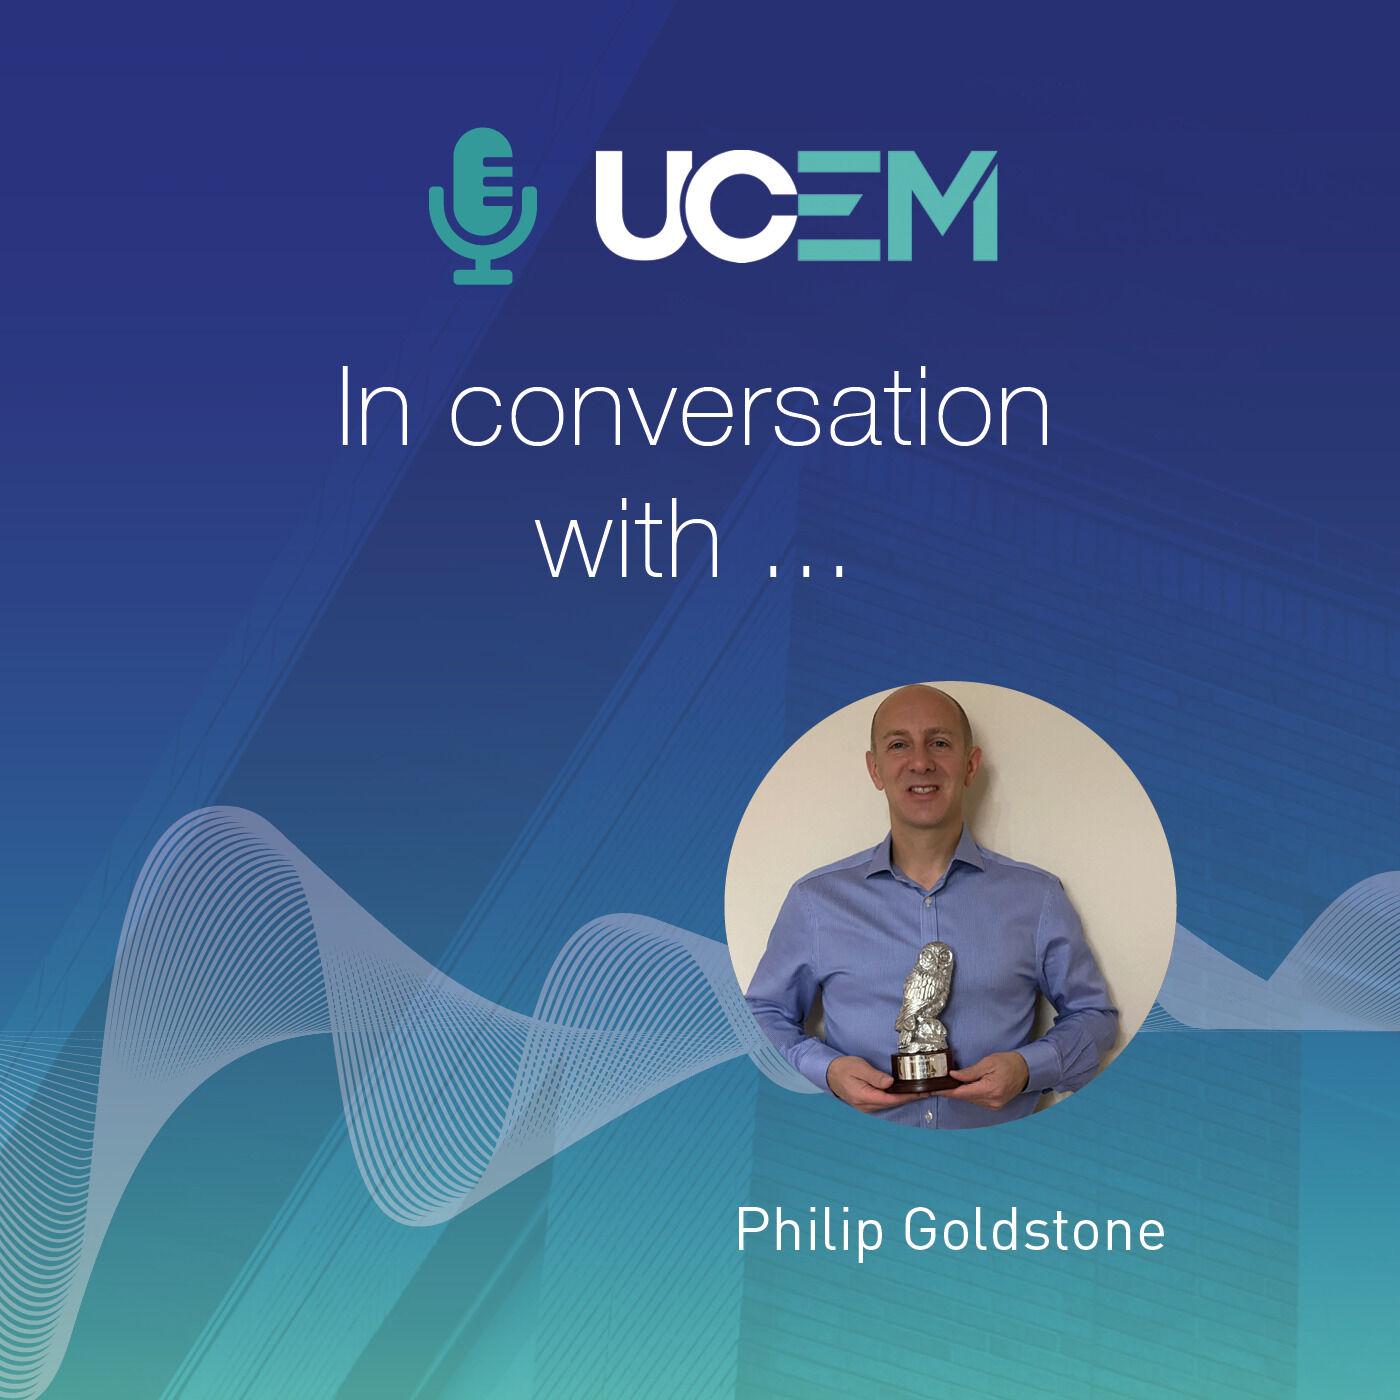 UCEM in conversation with... Philip Goldstone - Episode 3